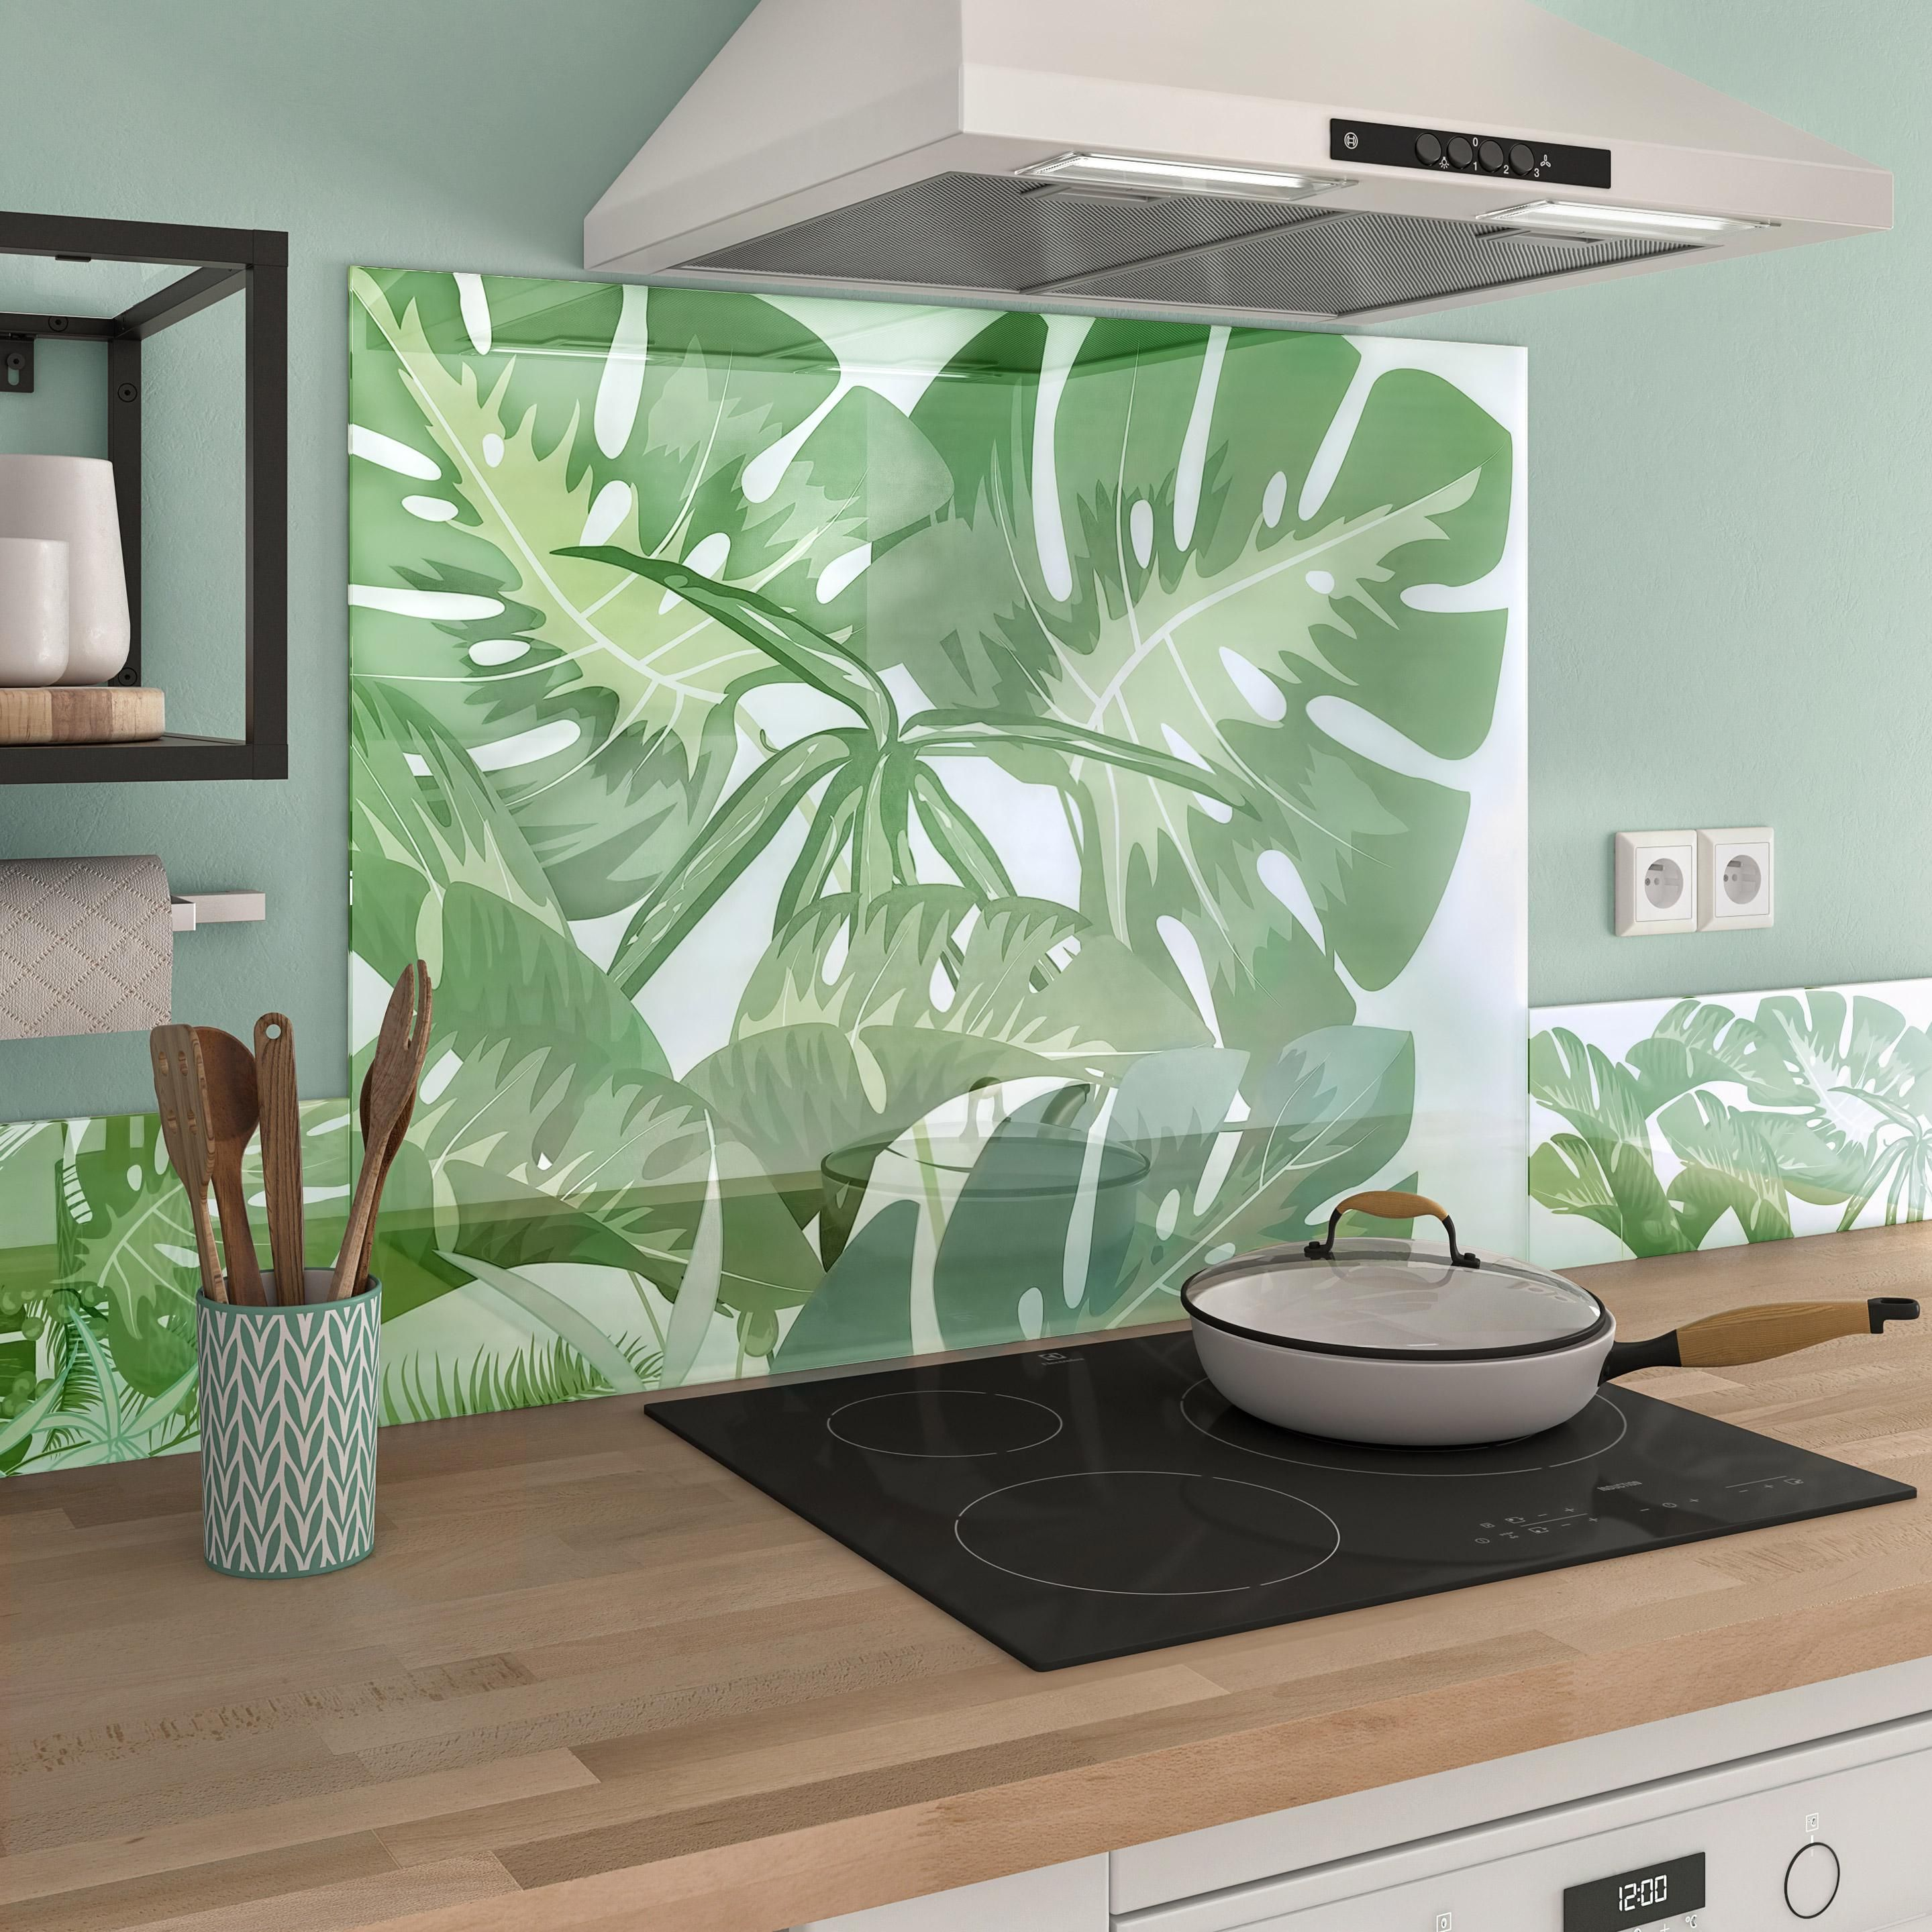 Fond De Hotte Verre Ikea fond de hotte verre gwada h.70 cm x ep.5 mm x l.90 cm | fond